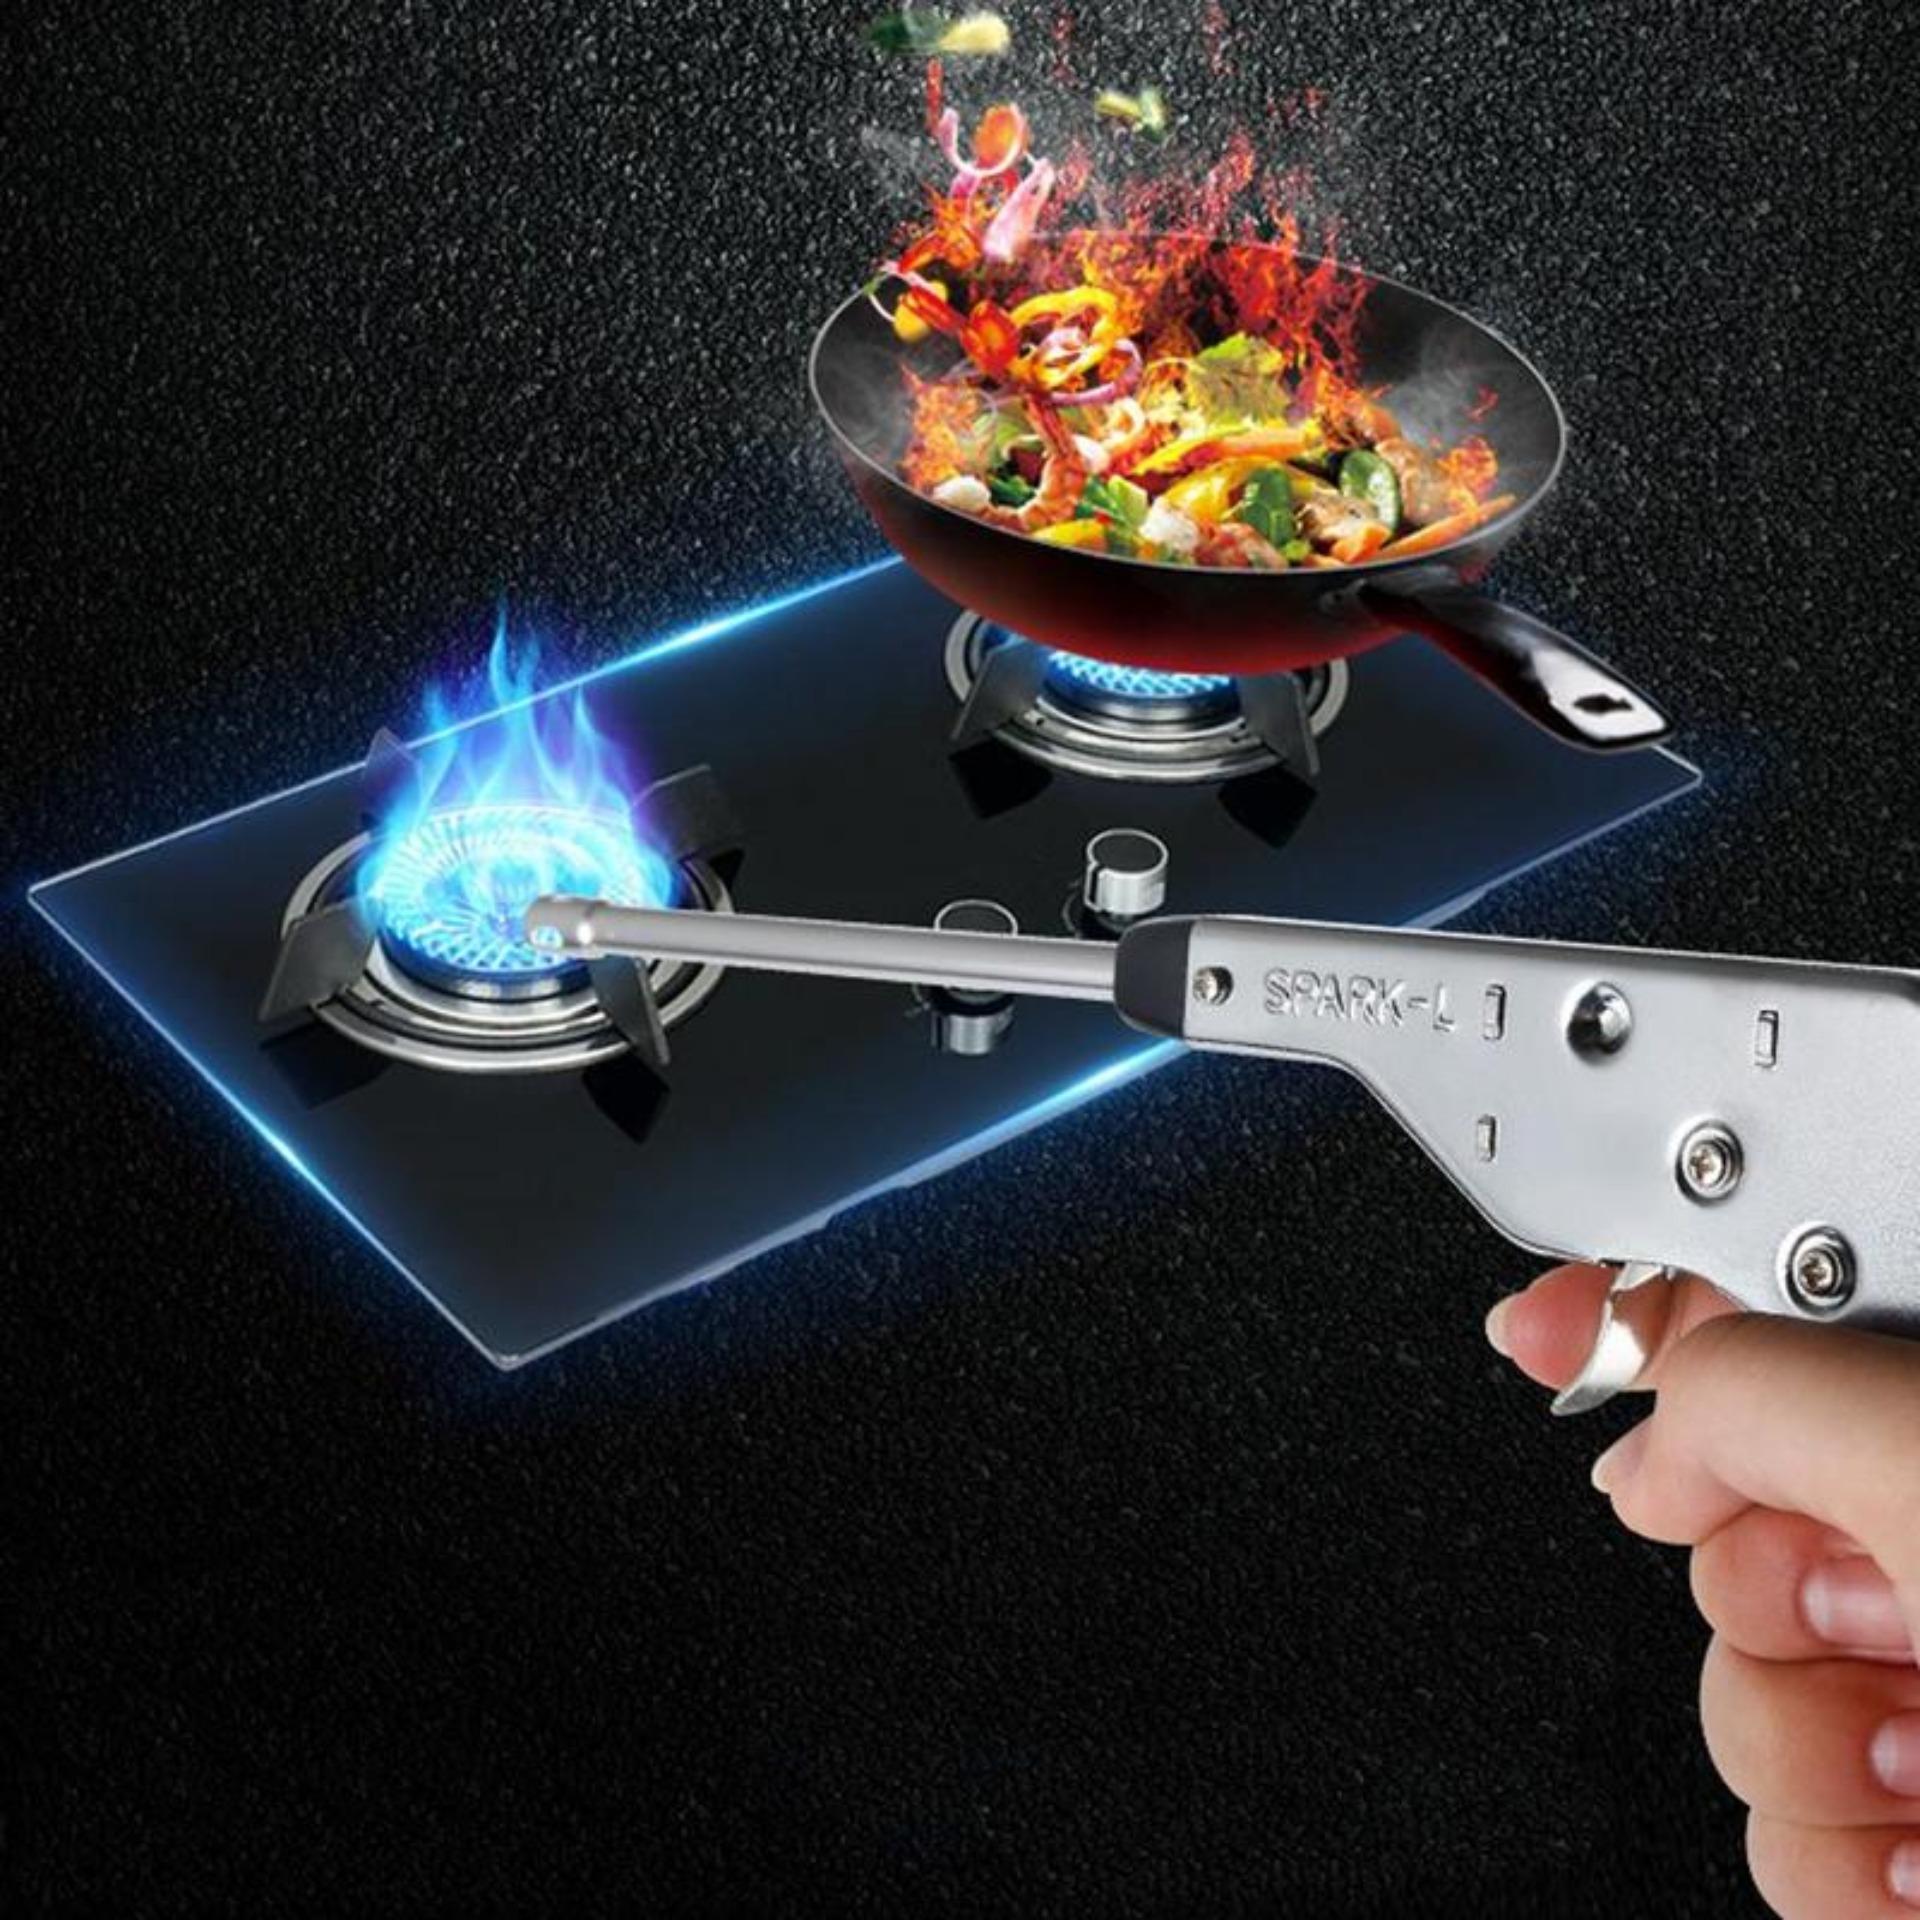 Bật lửa bếp ga-Bật lửa châm bếp ga[HKD]